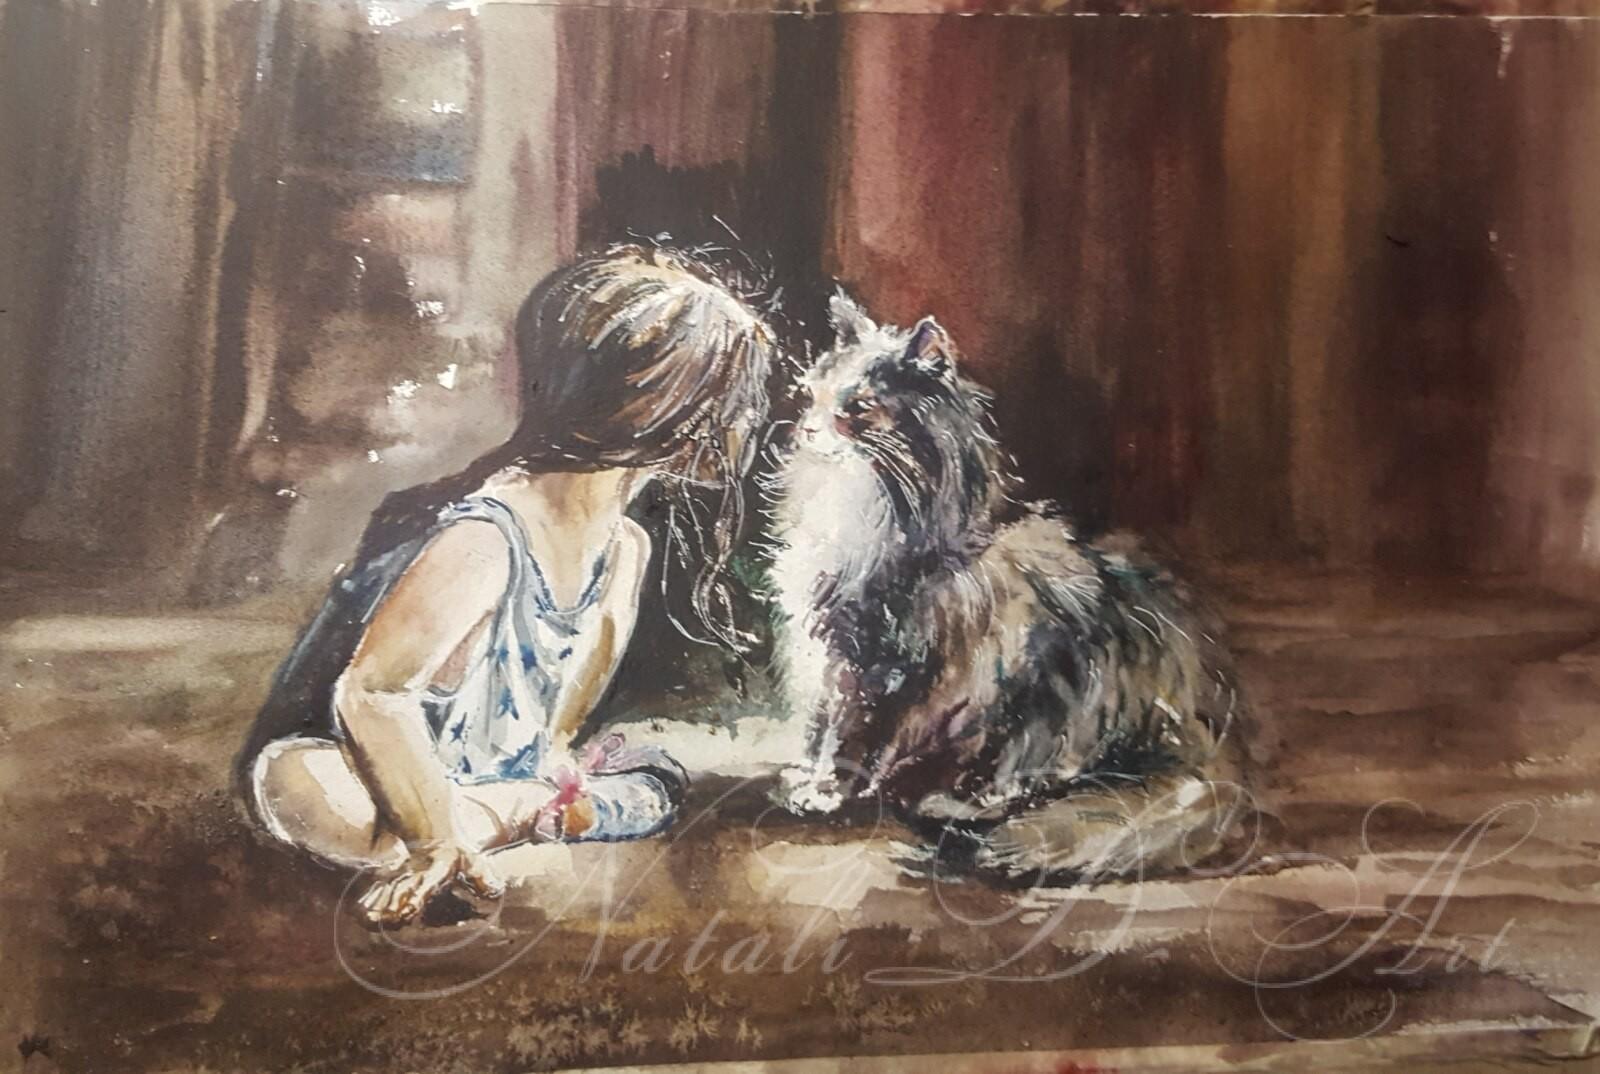 My watercolors